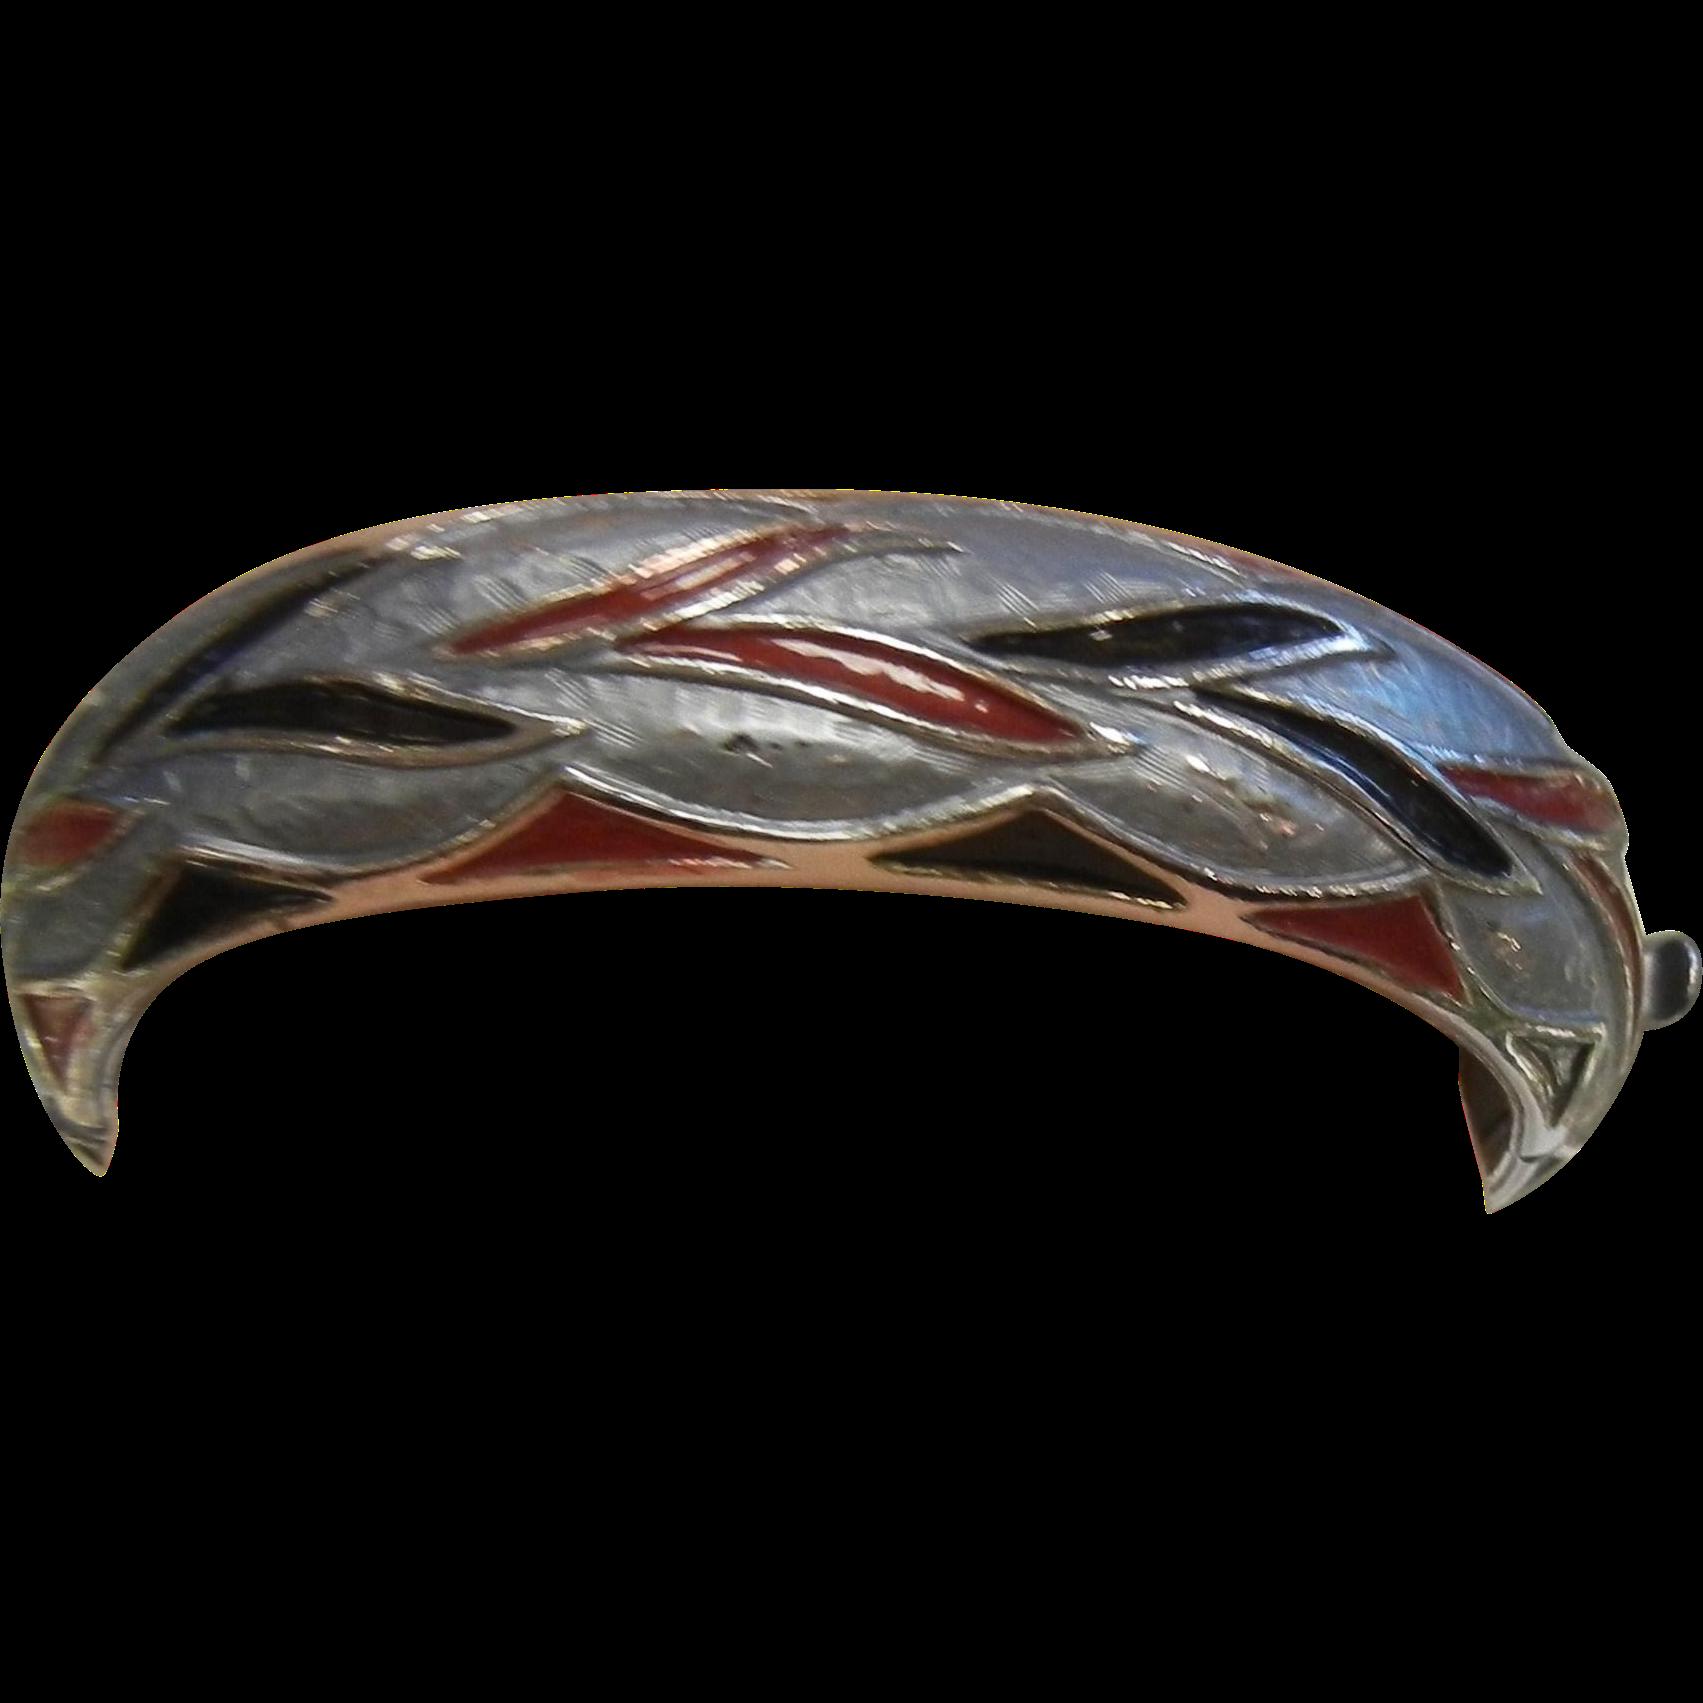 Vintage Silver-Tone Hinged Cuff Bracelet w/ Red & Black Enamel